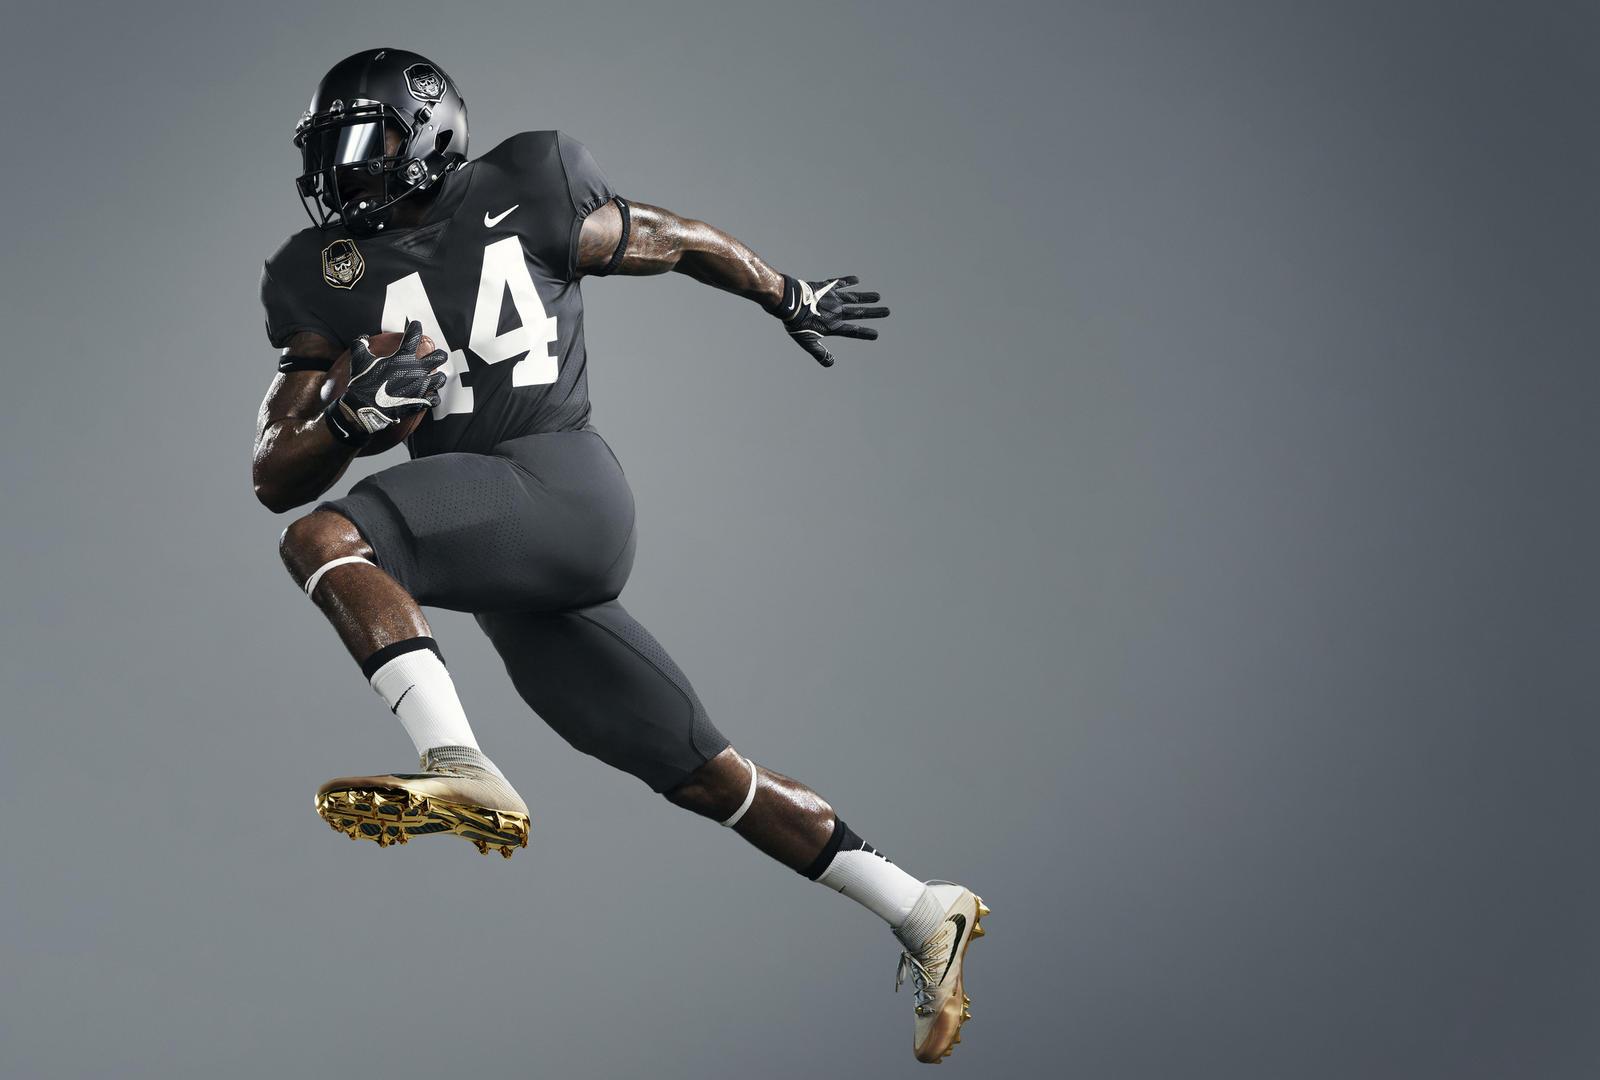 Nike Vapor Football Untouchable